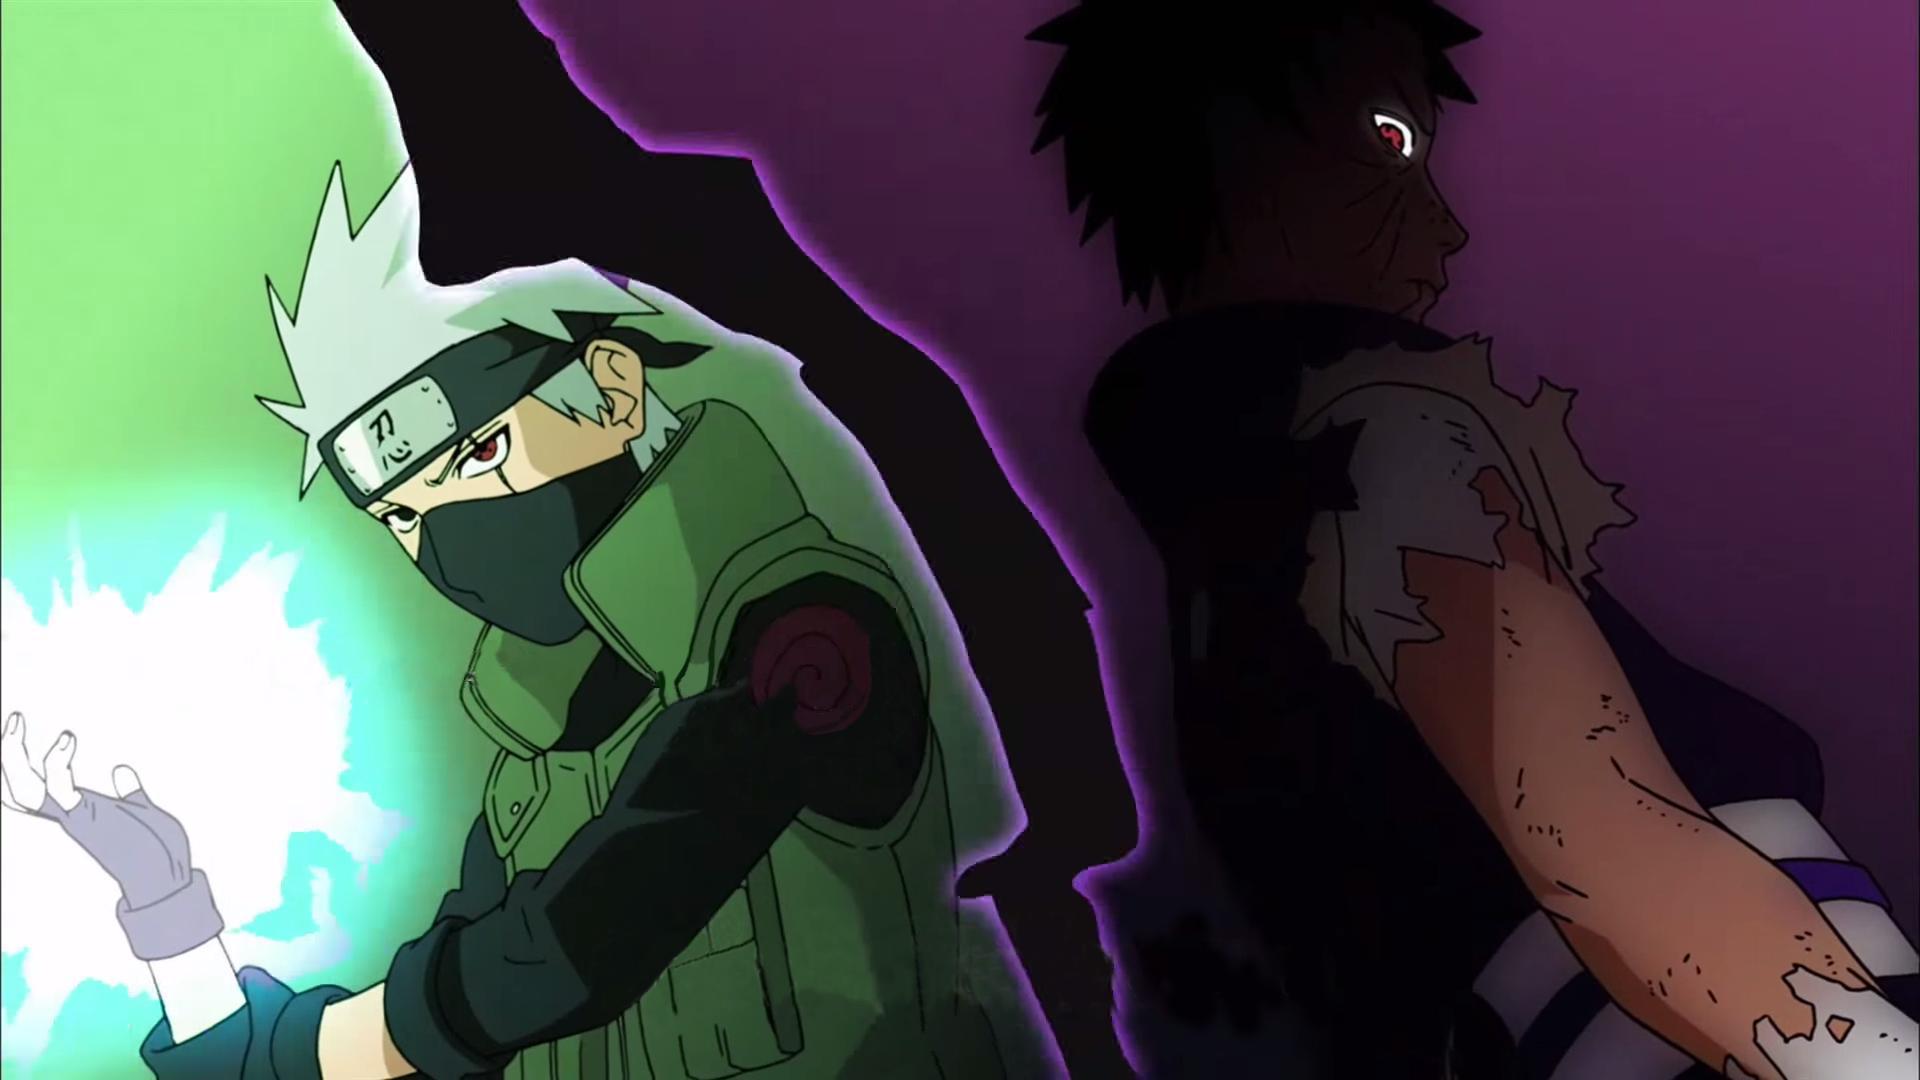 Anime My Top Ten Naruto Shippuden Openings Endings Cilla Vs Games